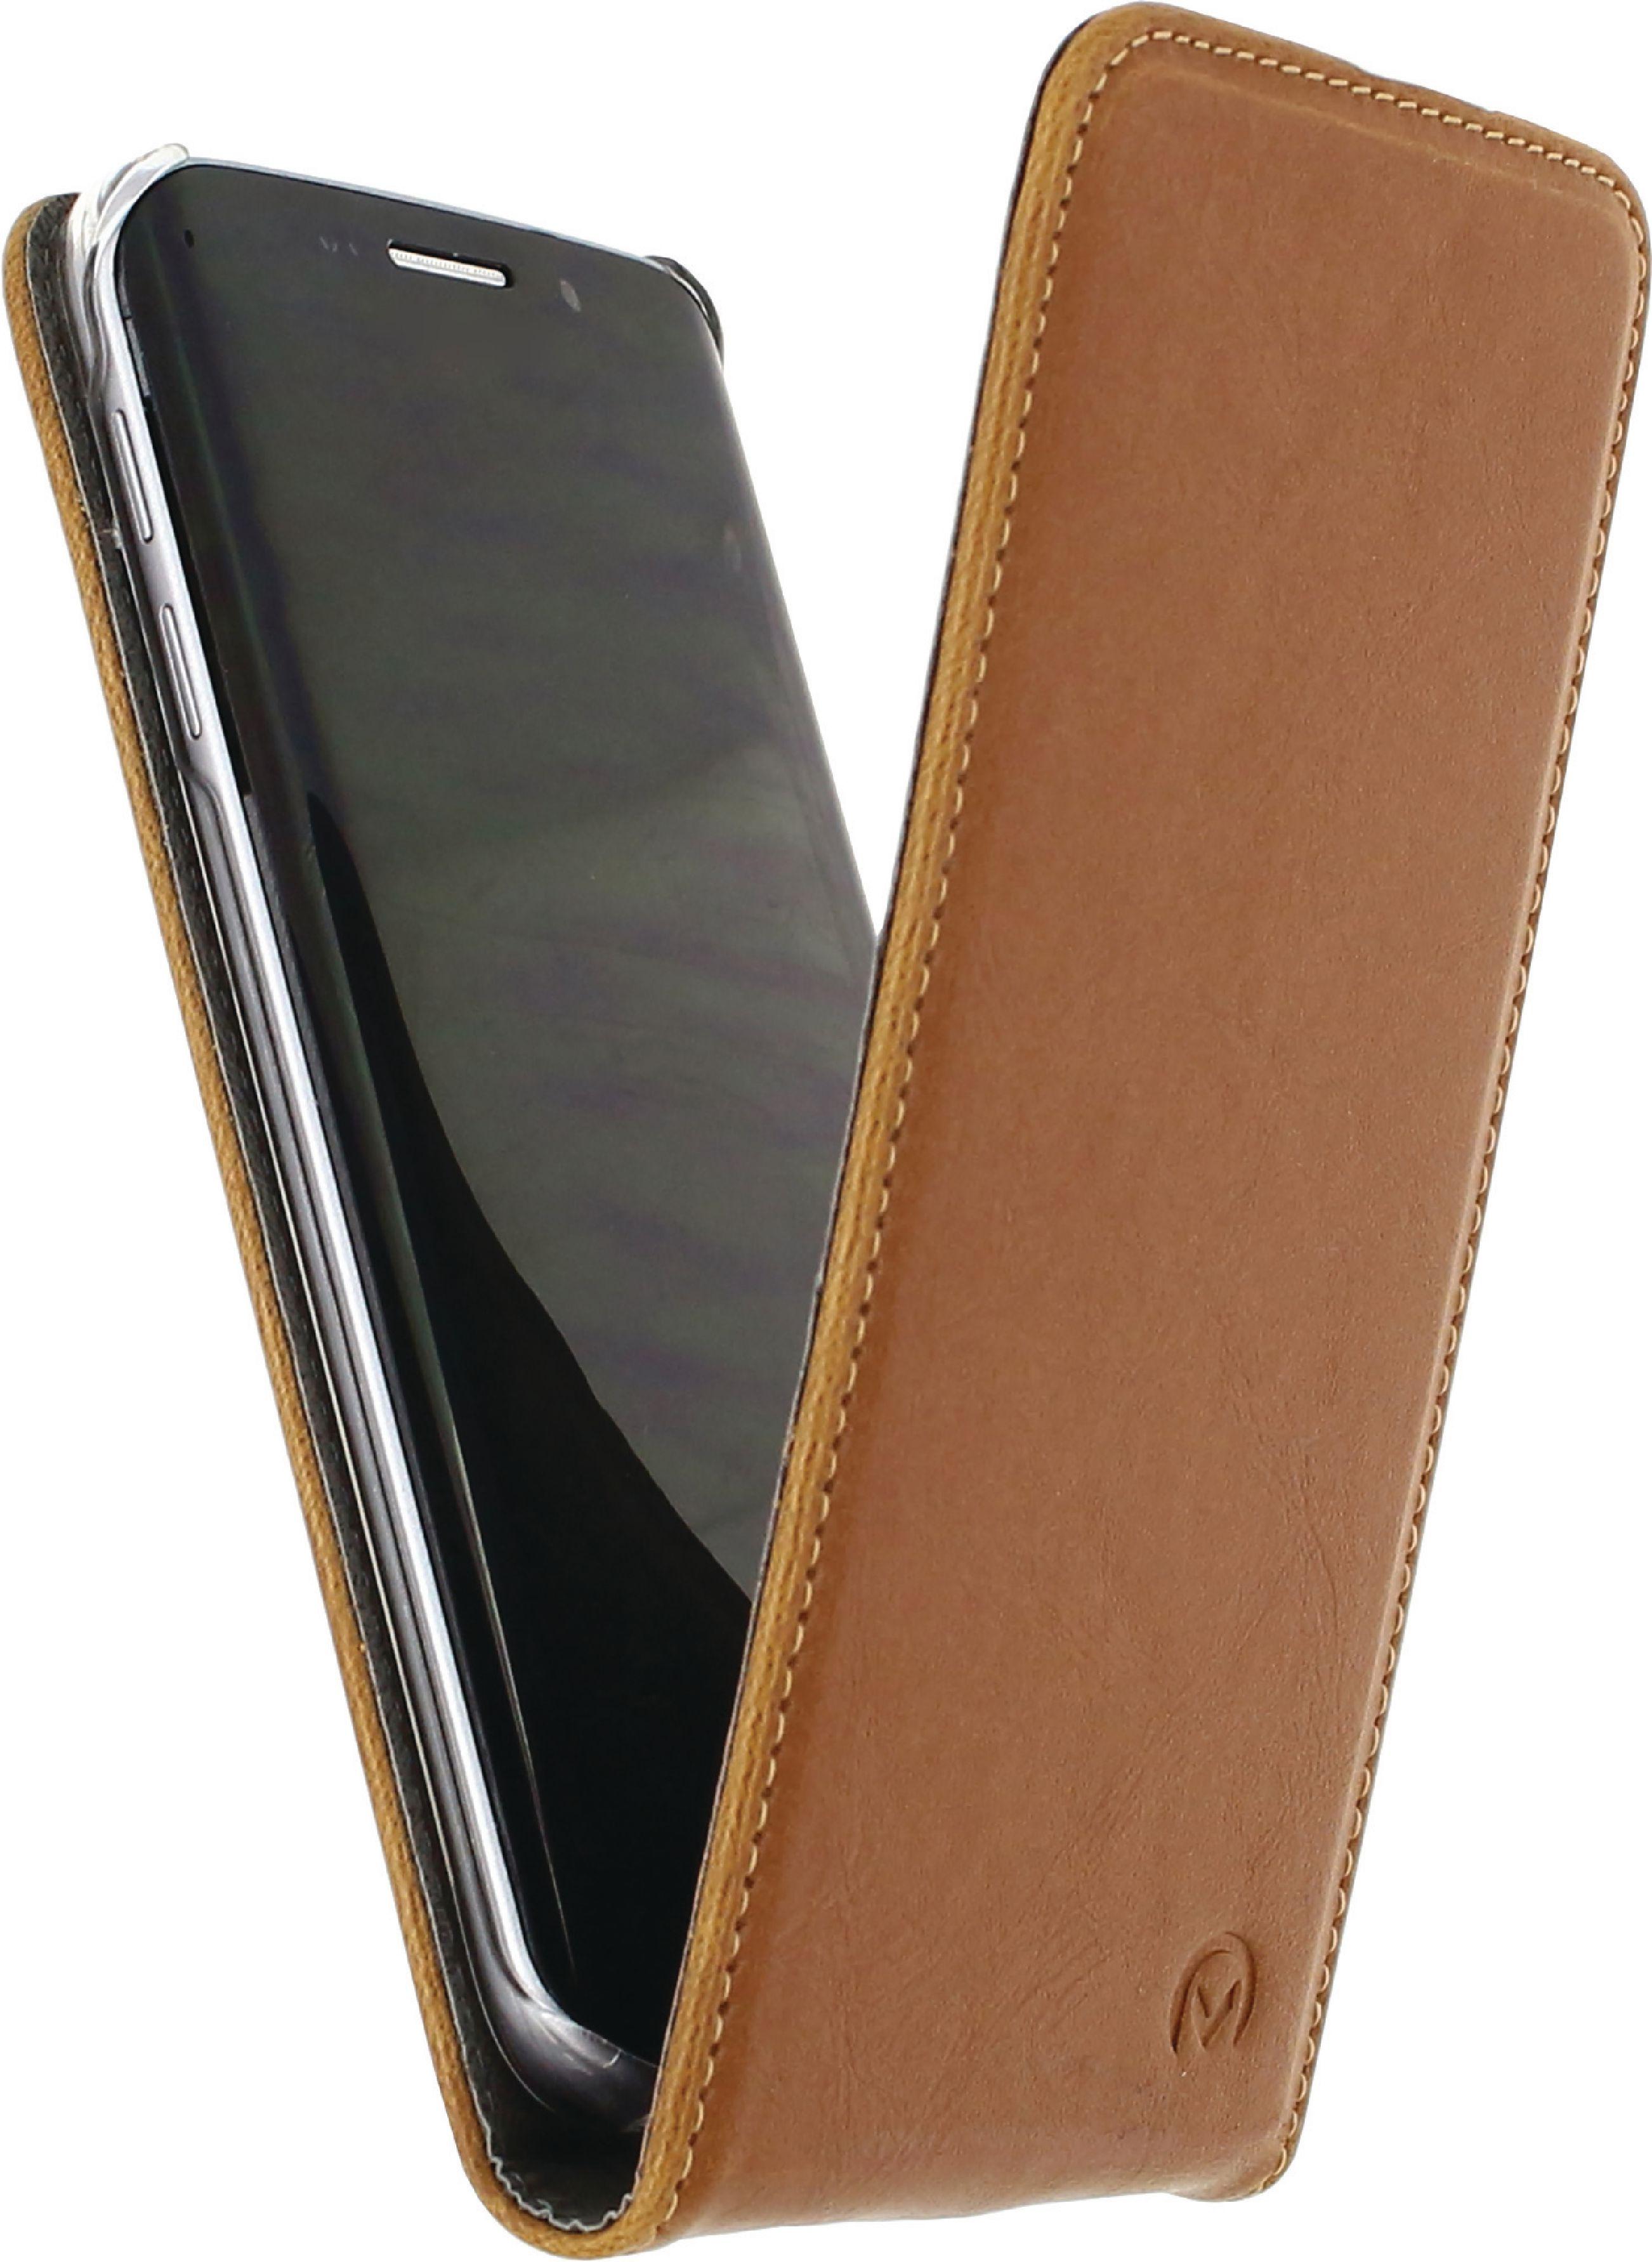 Image of   Telefon Premium Vippeetui med Magnet Samsung Galaxy S6 Edge+ Brun